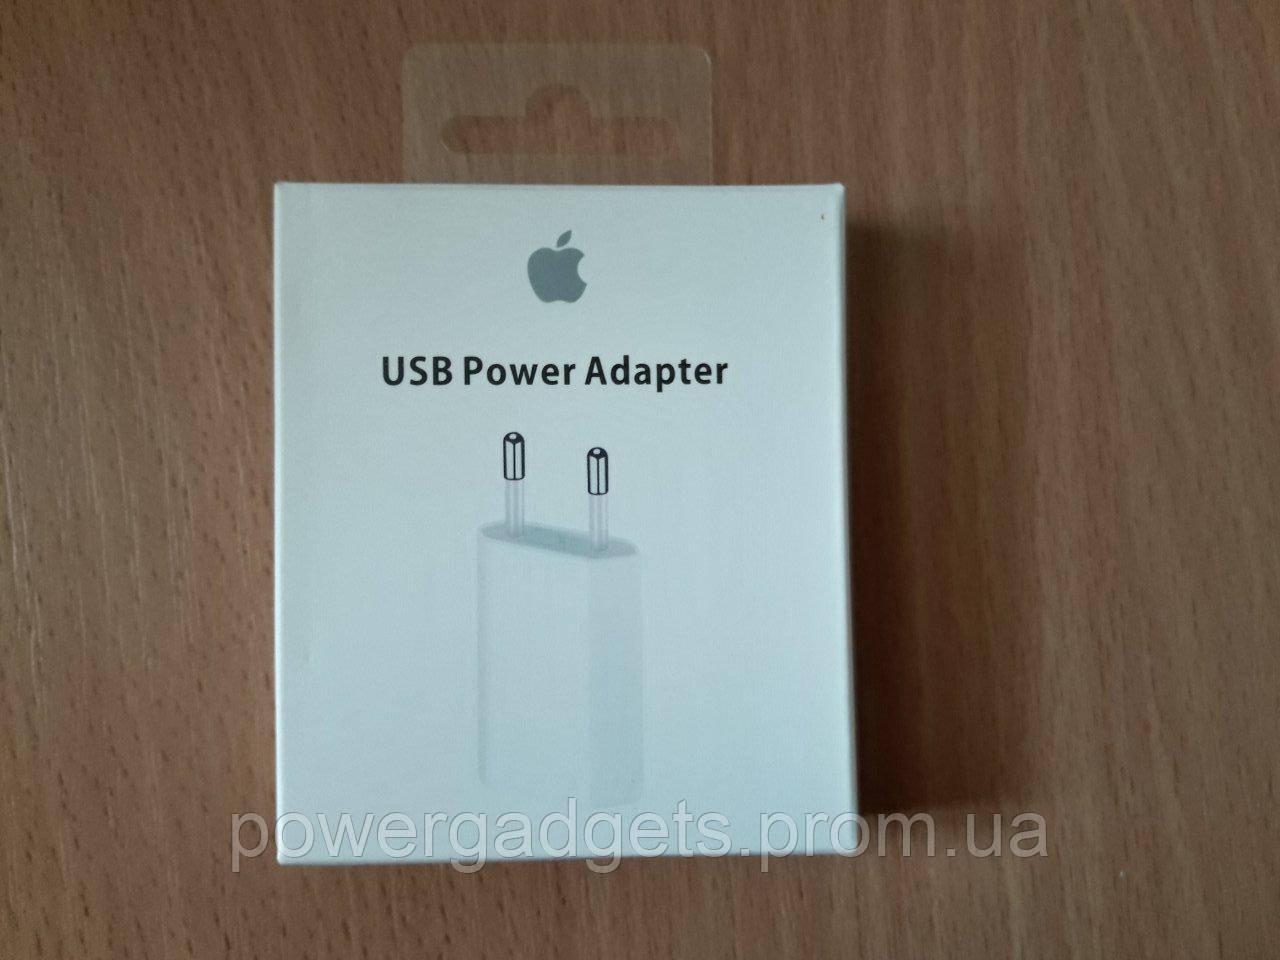 Сетевое зарядное устройство Apple 5V 1A 5W оригинал